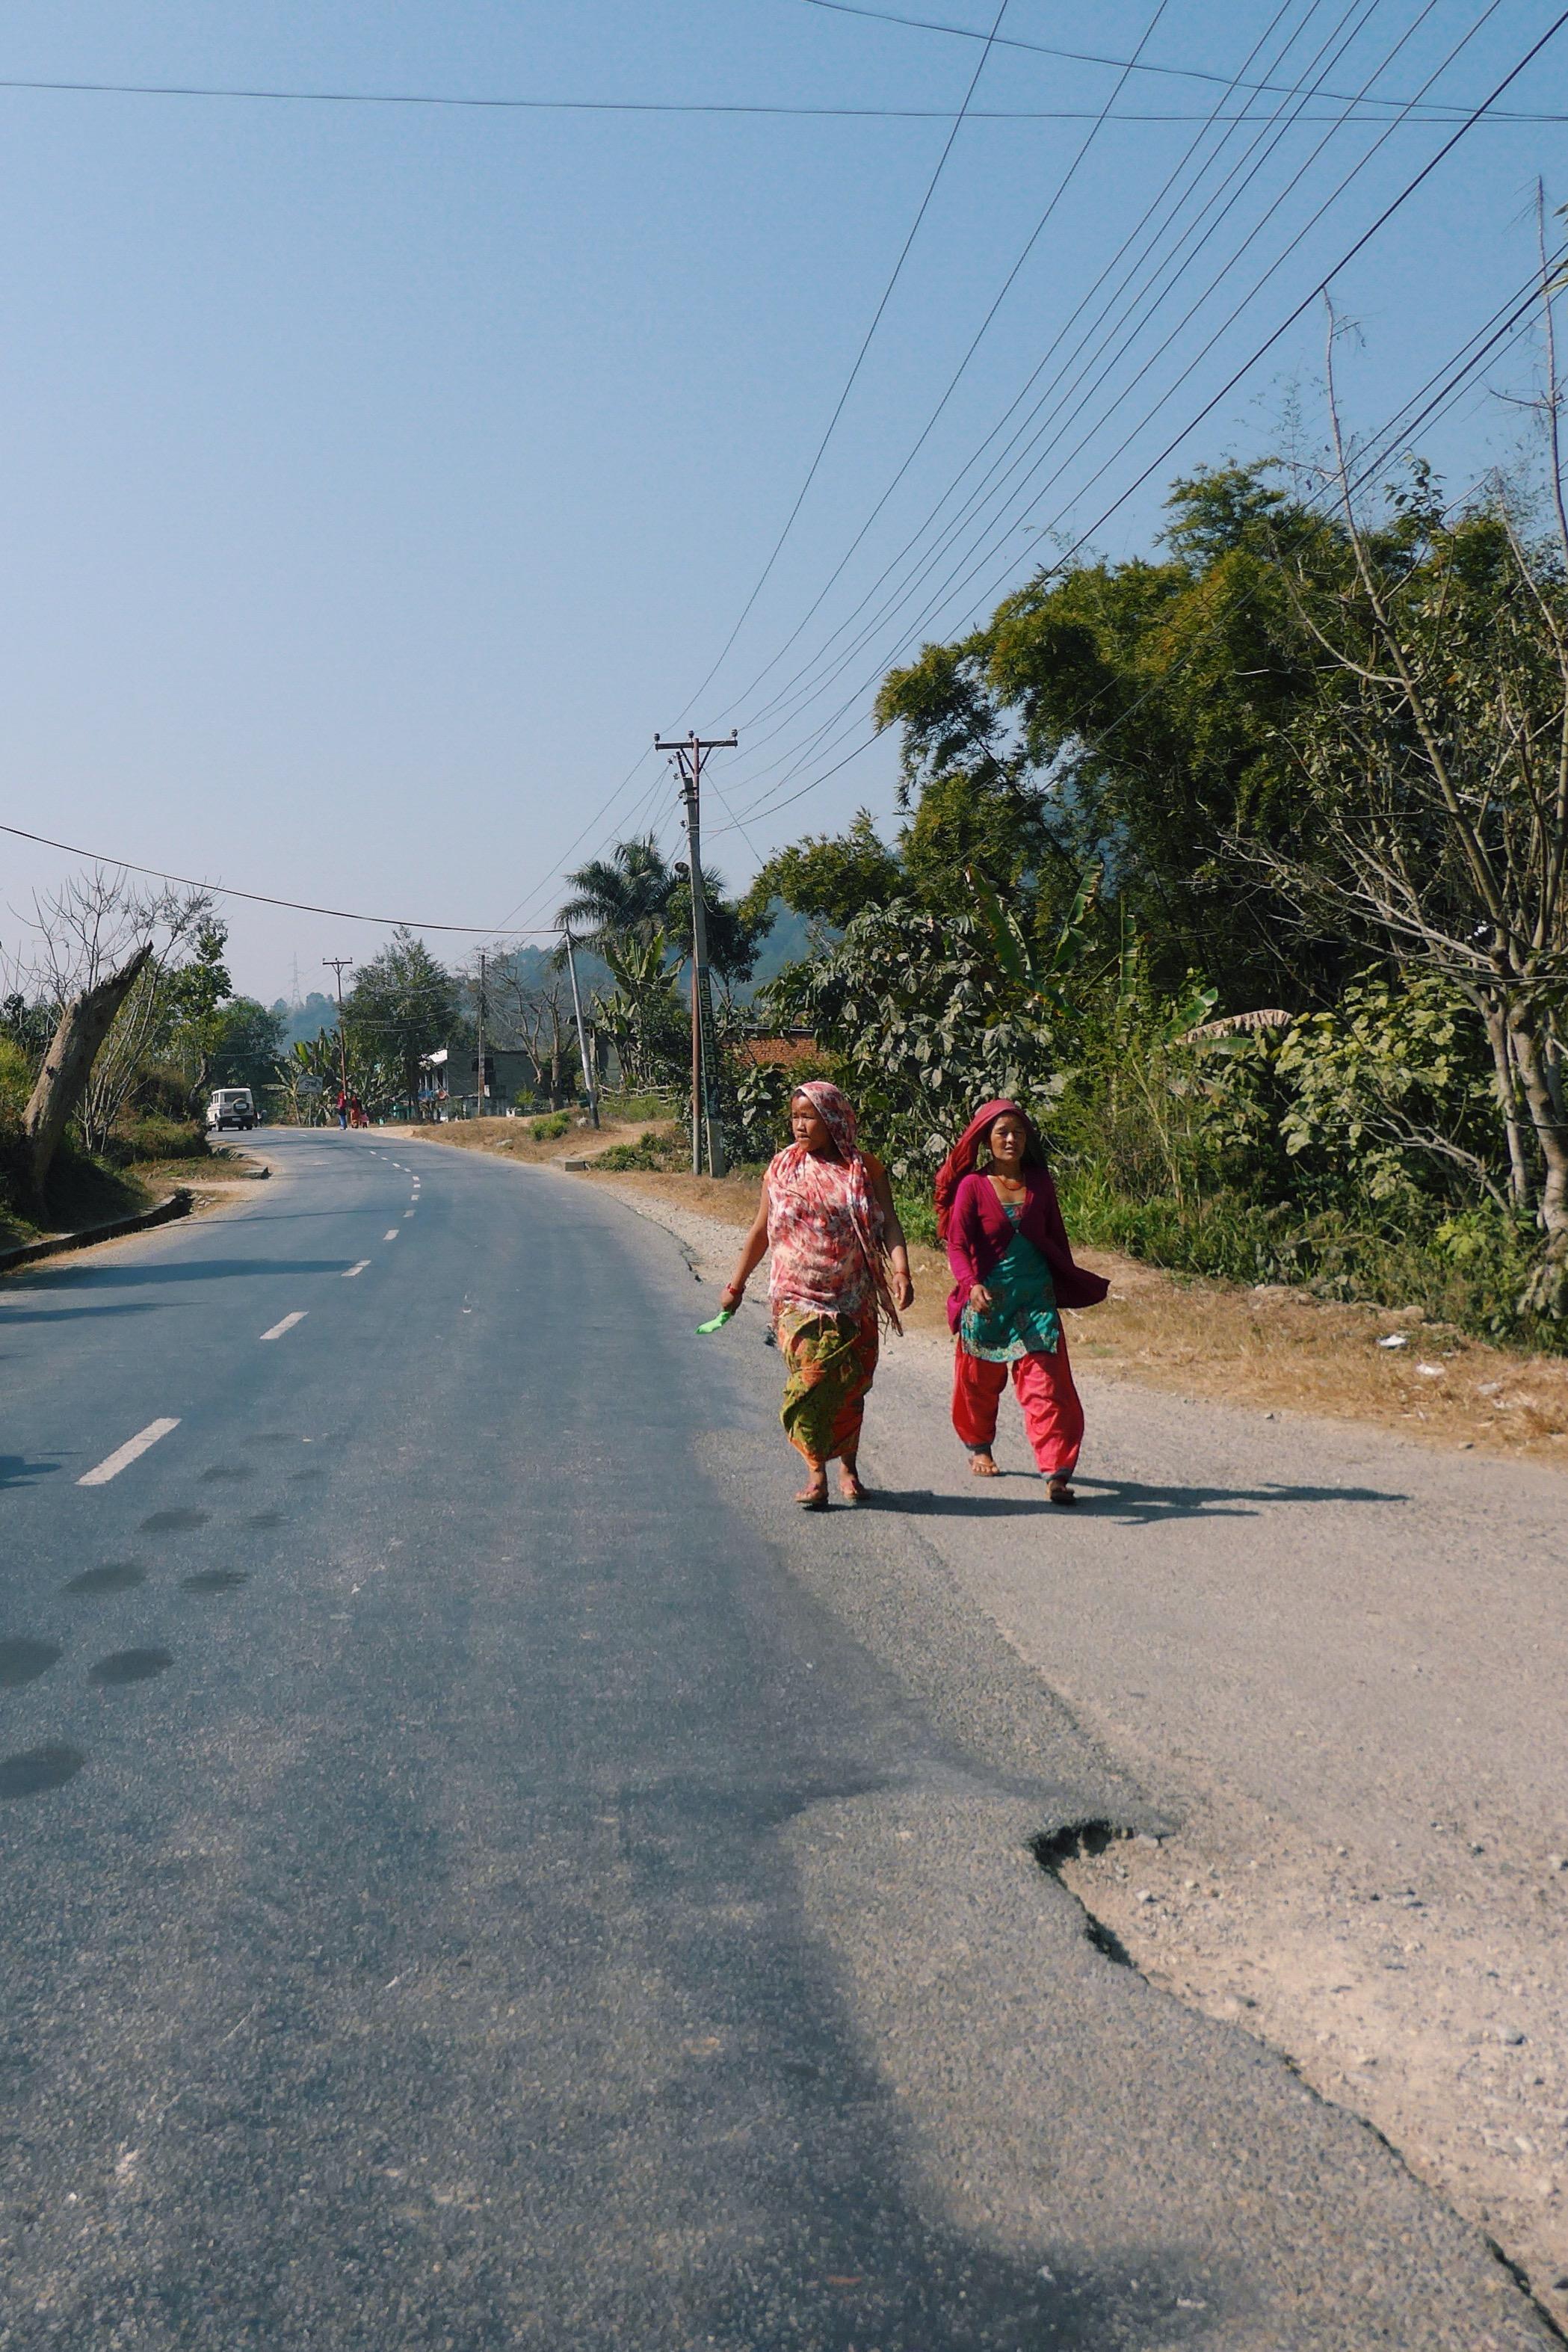 Pokhara Travel Blog